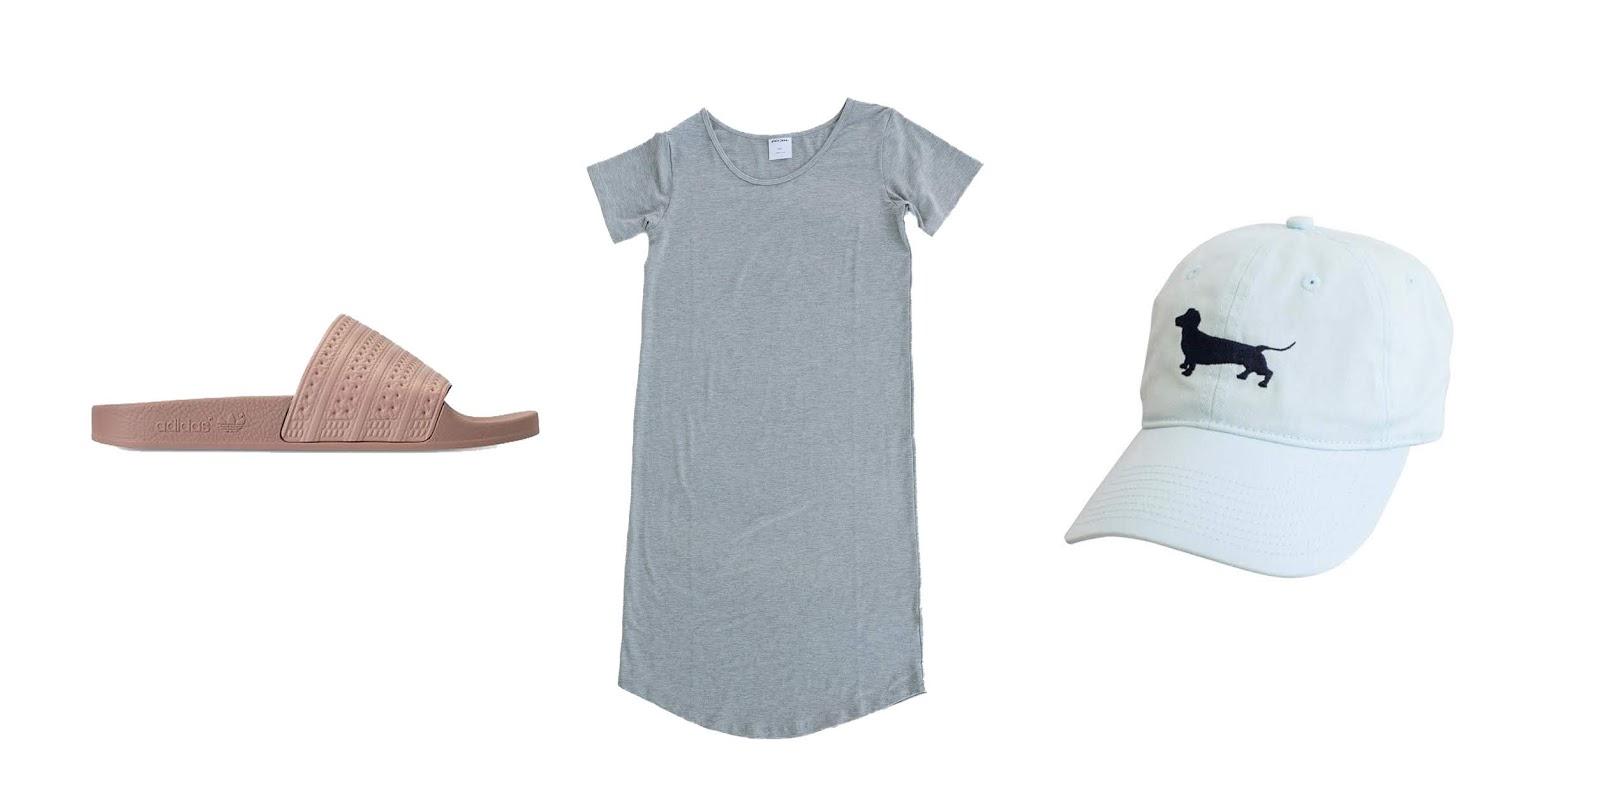 College Blogger, Lifestyle Blogger, Wisconsin Blogger, Favorite Things, Adidas Womens Adilette Slides Blush Pink, Very Jane Tshirt Dress, Seaside Weiner Dog Baseball Hat